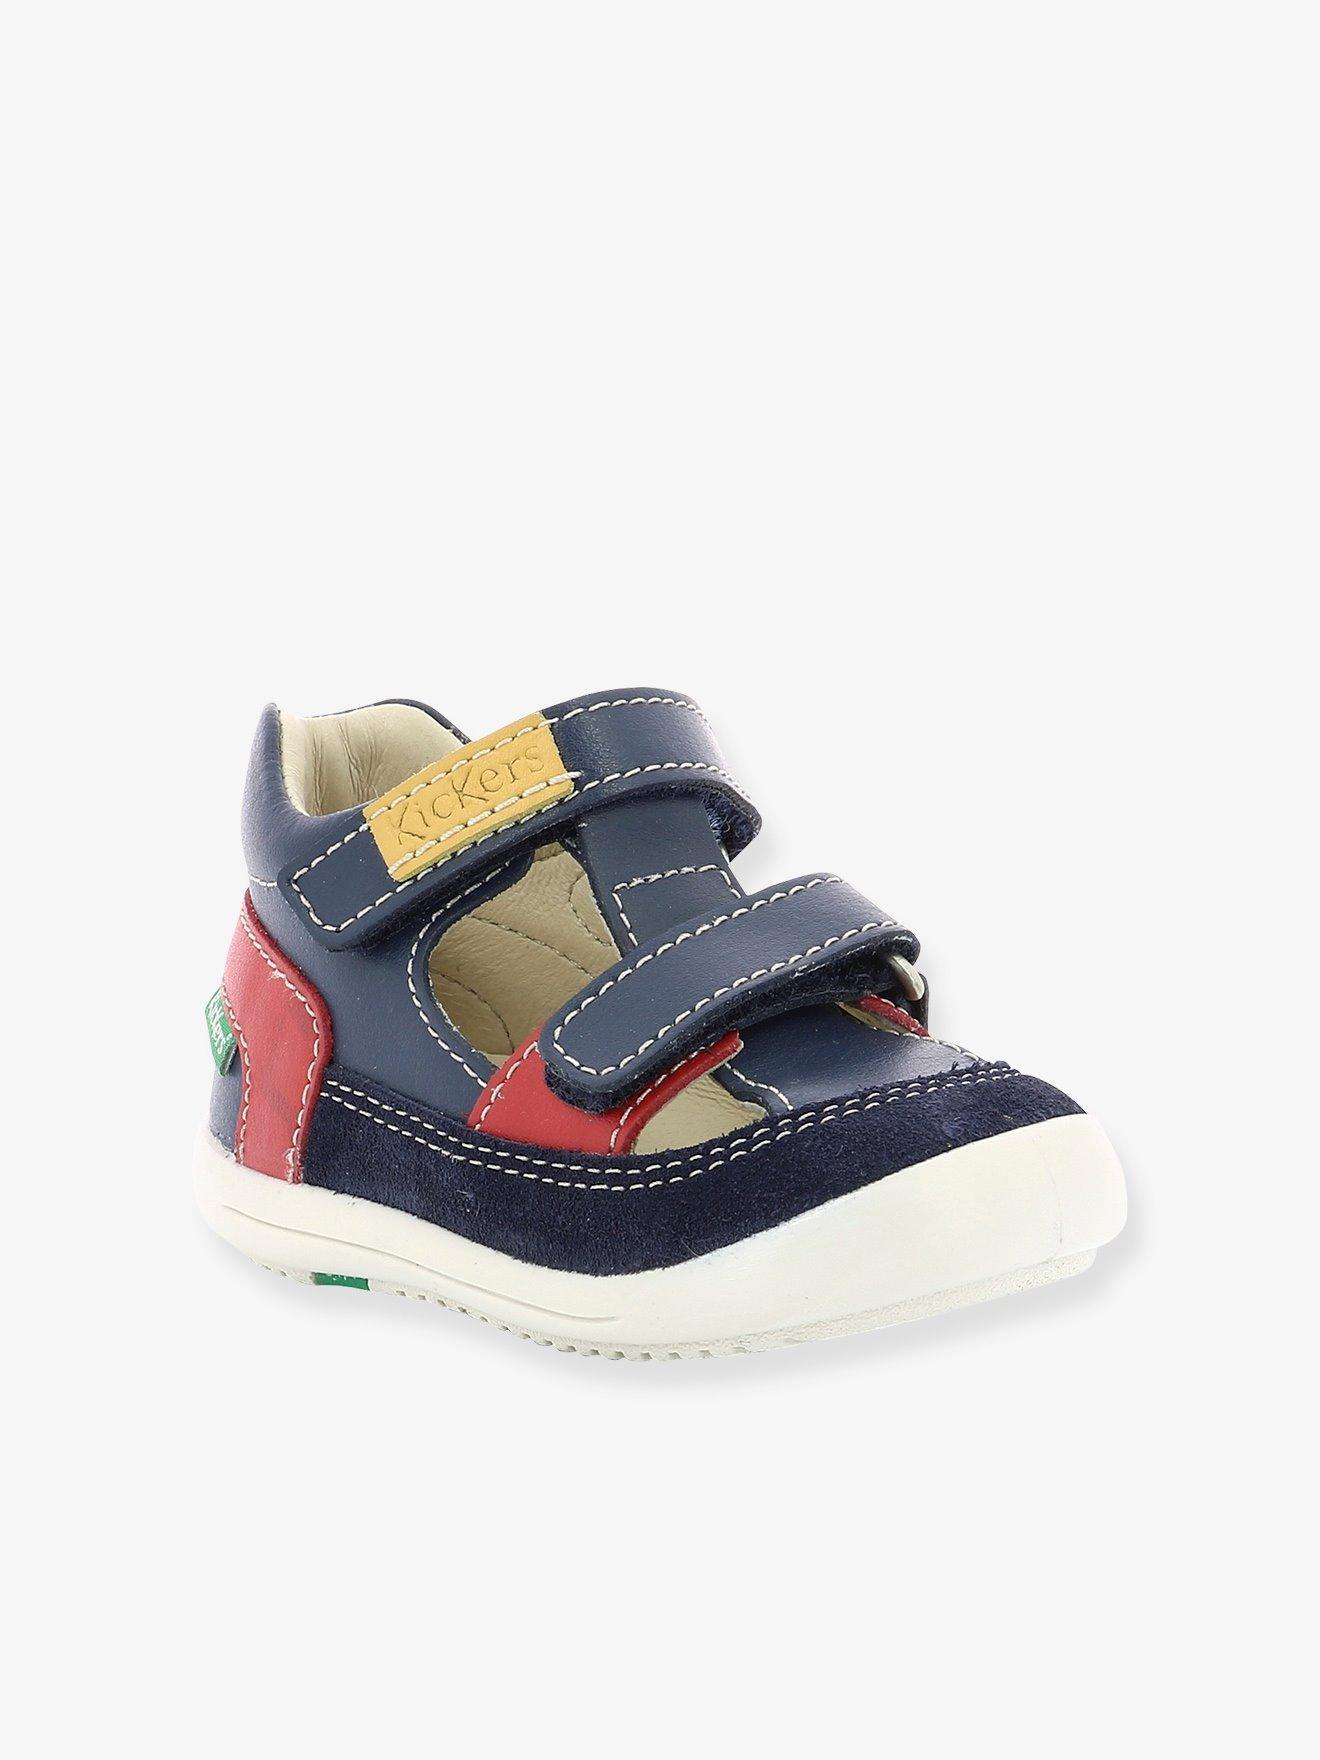 55c625cc9 Botines piel bebé kimono ® azul oscuro liso. Kickers